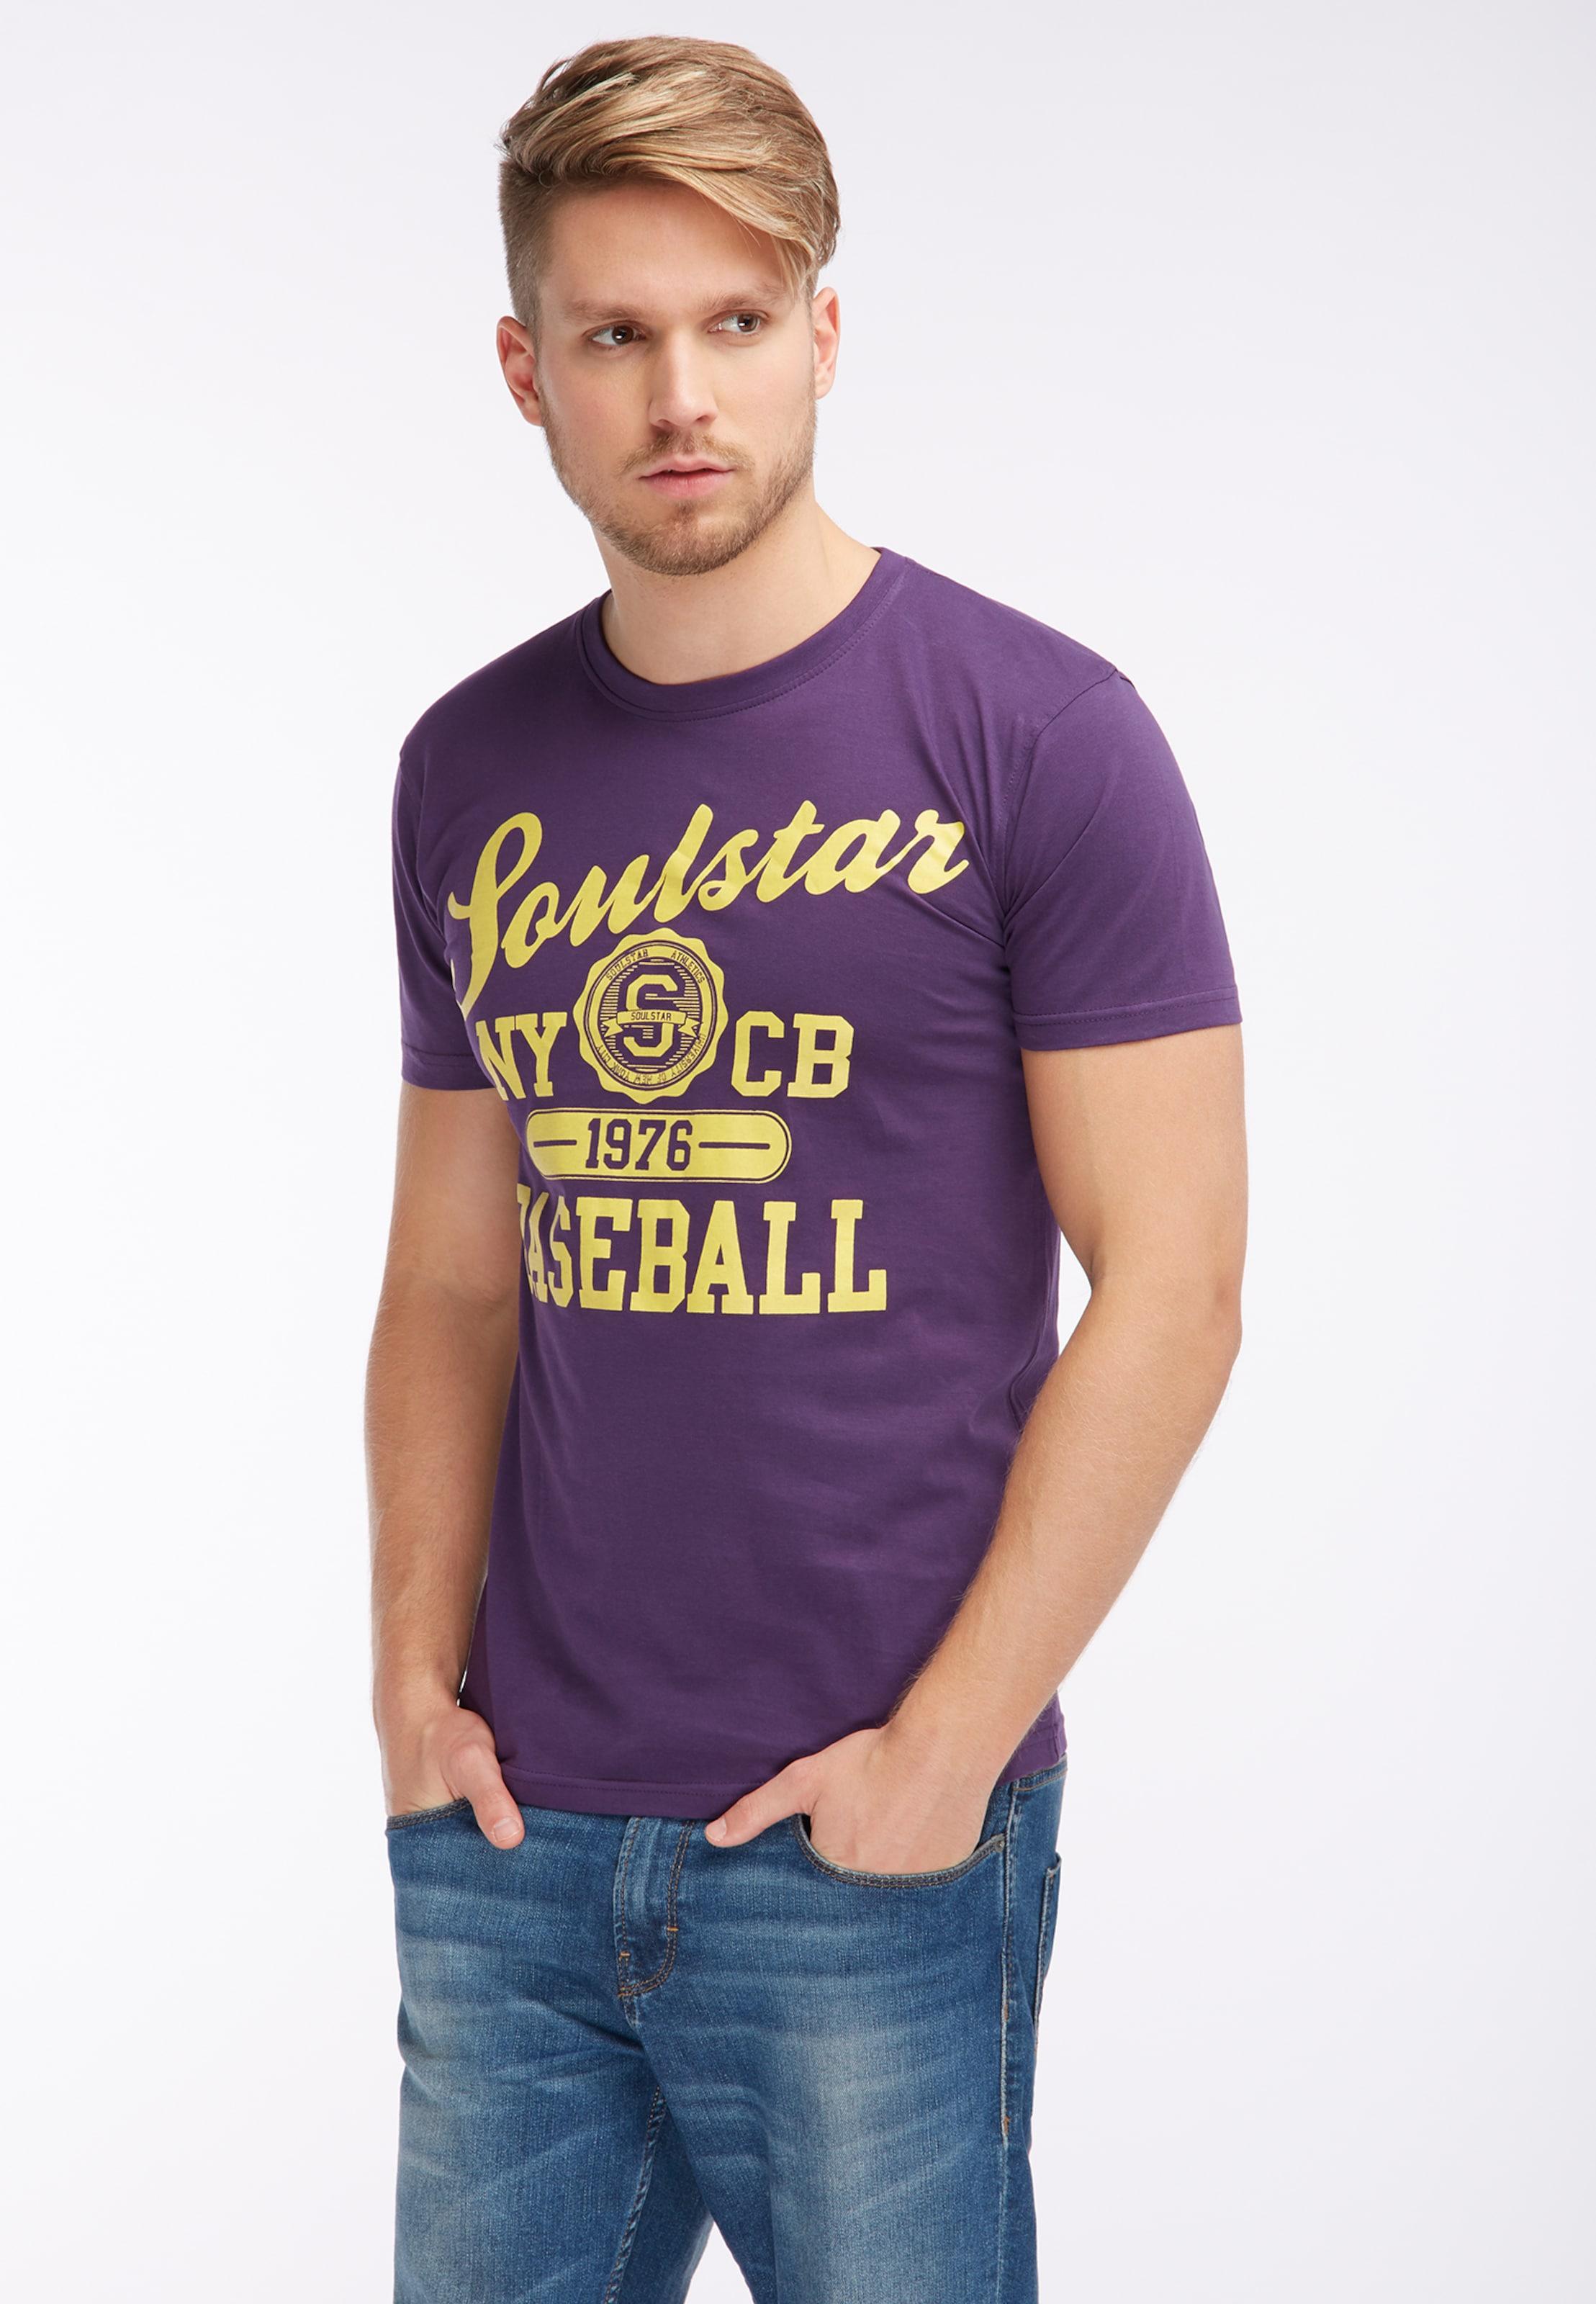 Soulstar In T T Soulstar In Aubergine shirt shirt E9DH2I